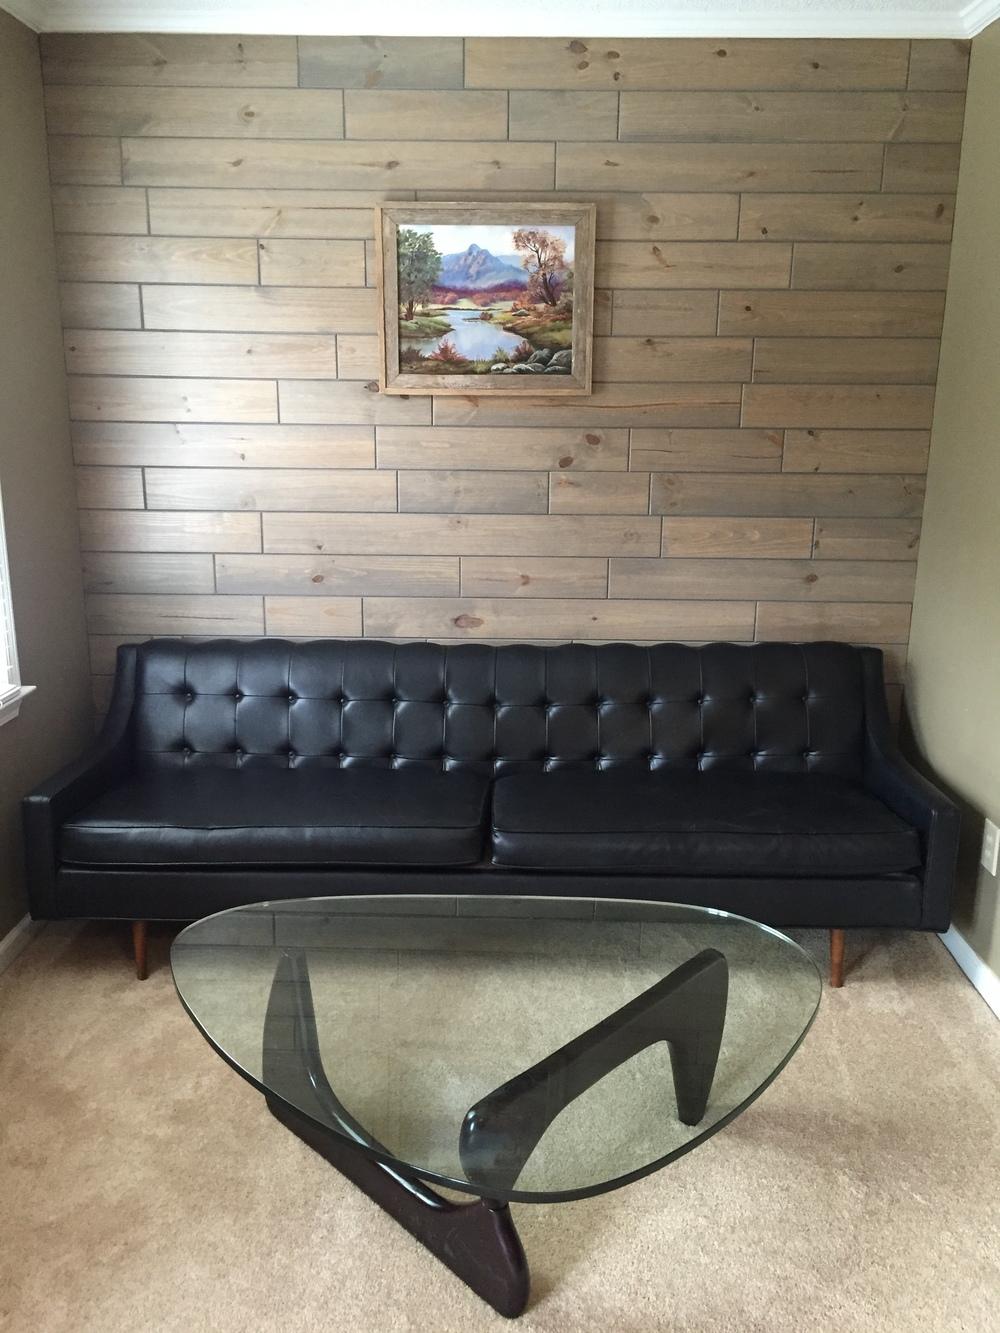 Tada!Wood walls + gray = classic yet trendy.